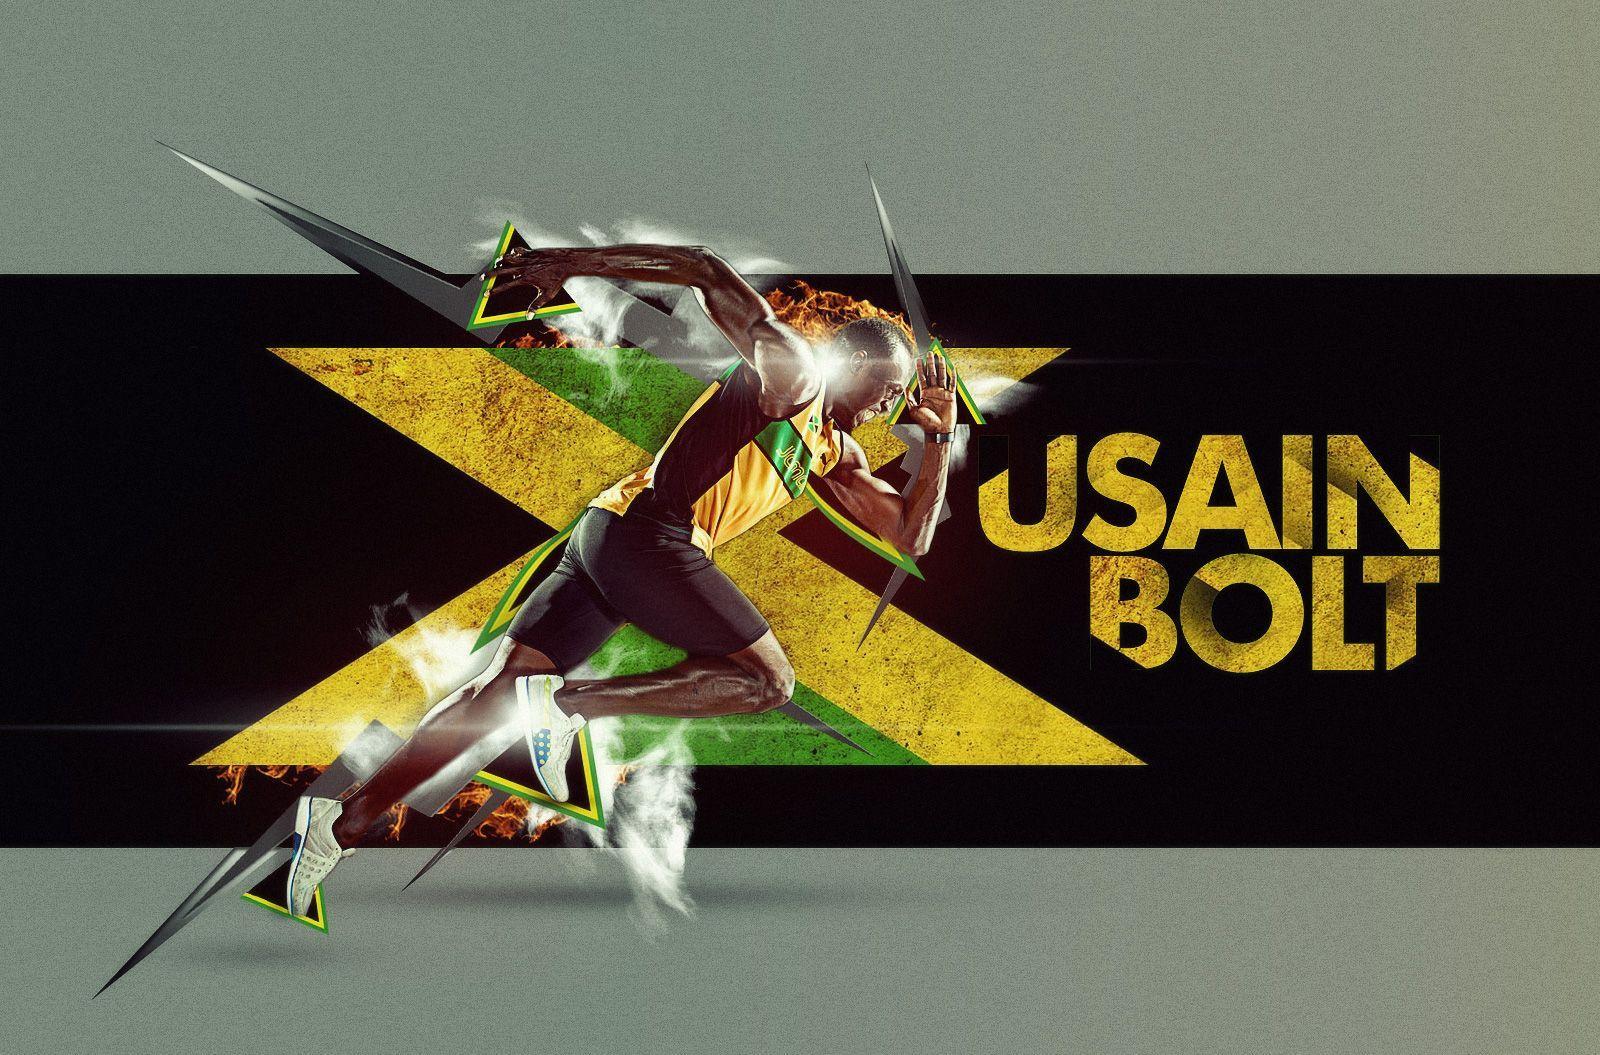 Usain Bolt Wallpapers 2016 Olympics Wallpaper Cave